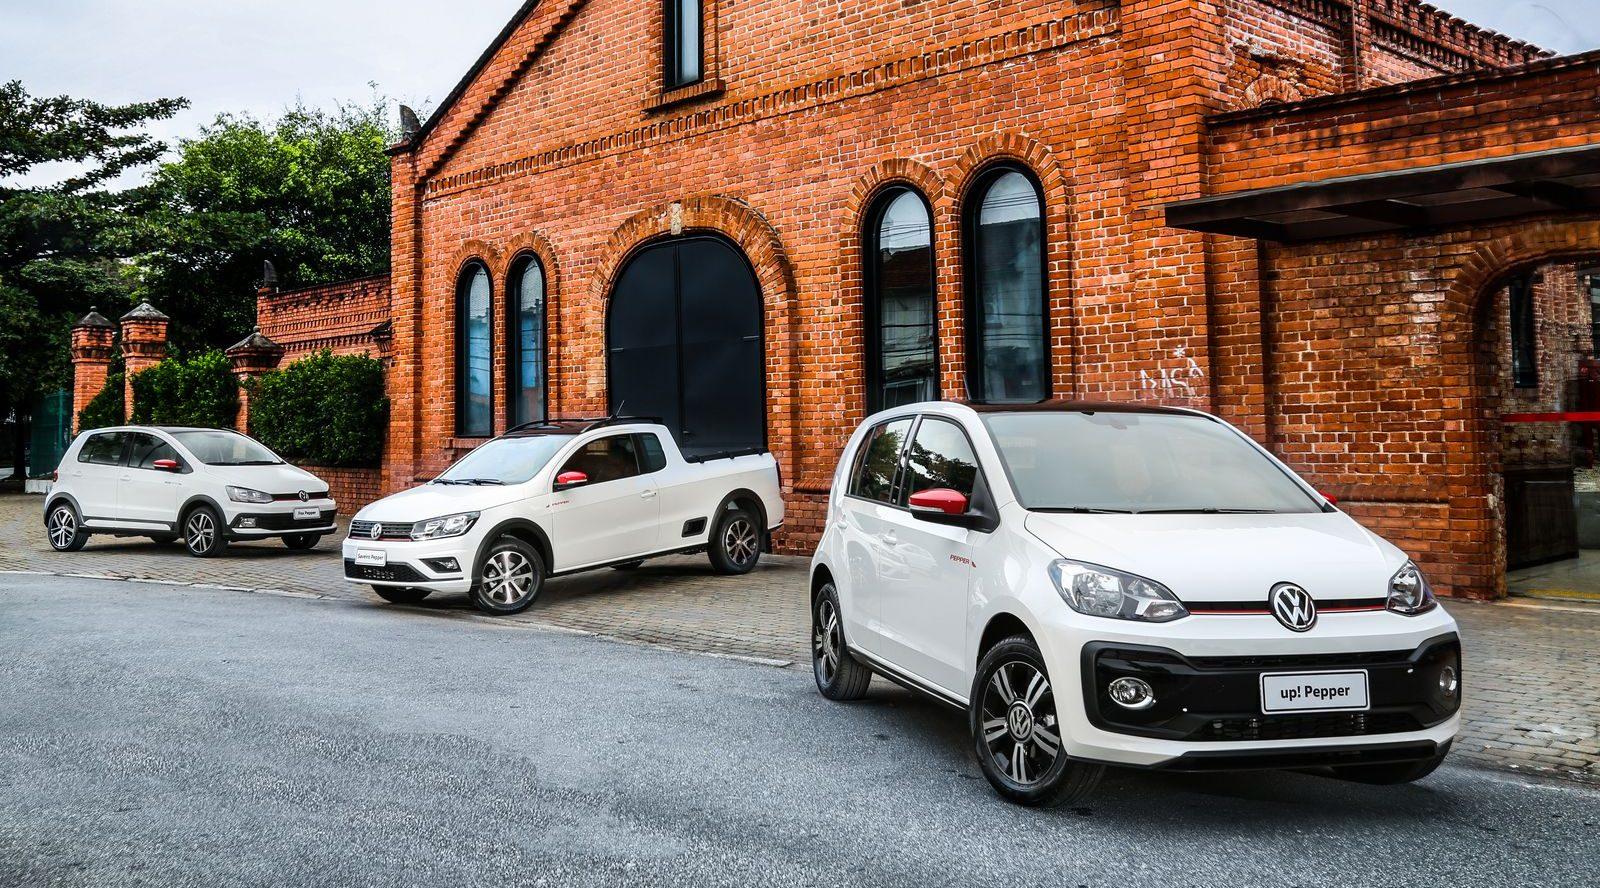 Volkswagen confirma retorno da linha Pepper